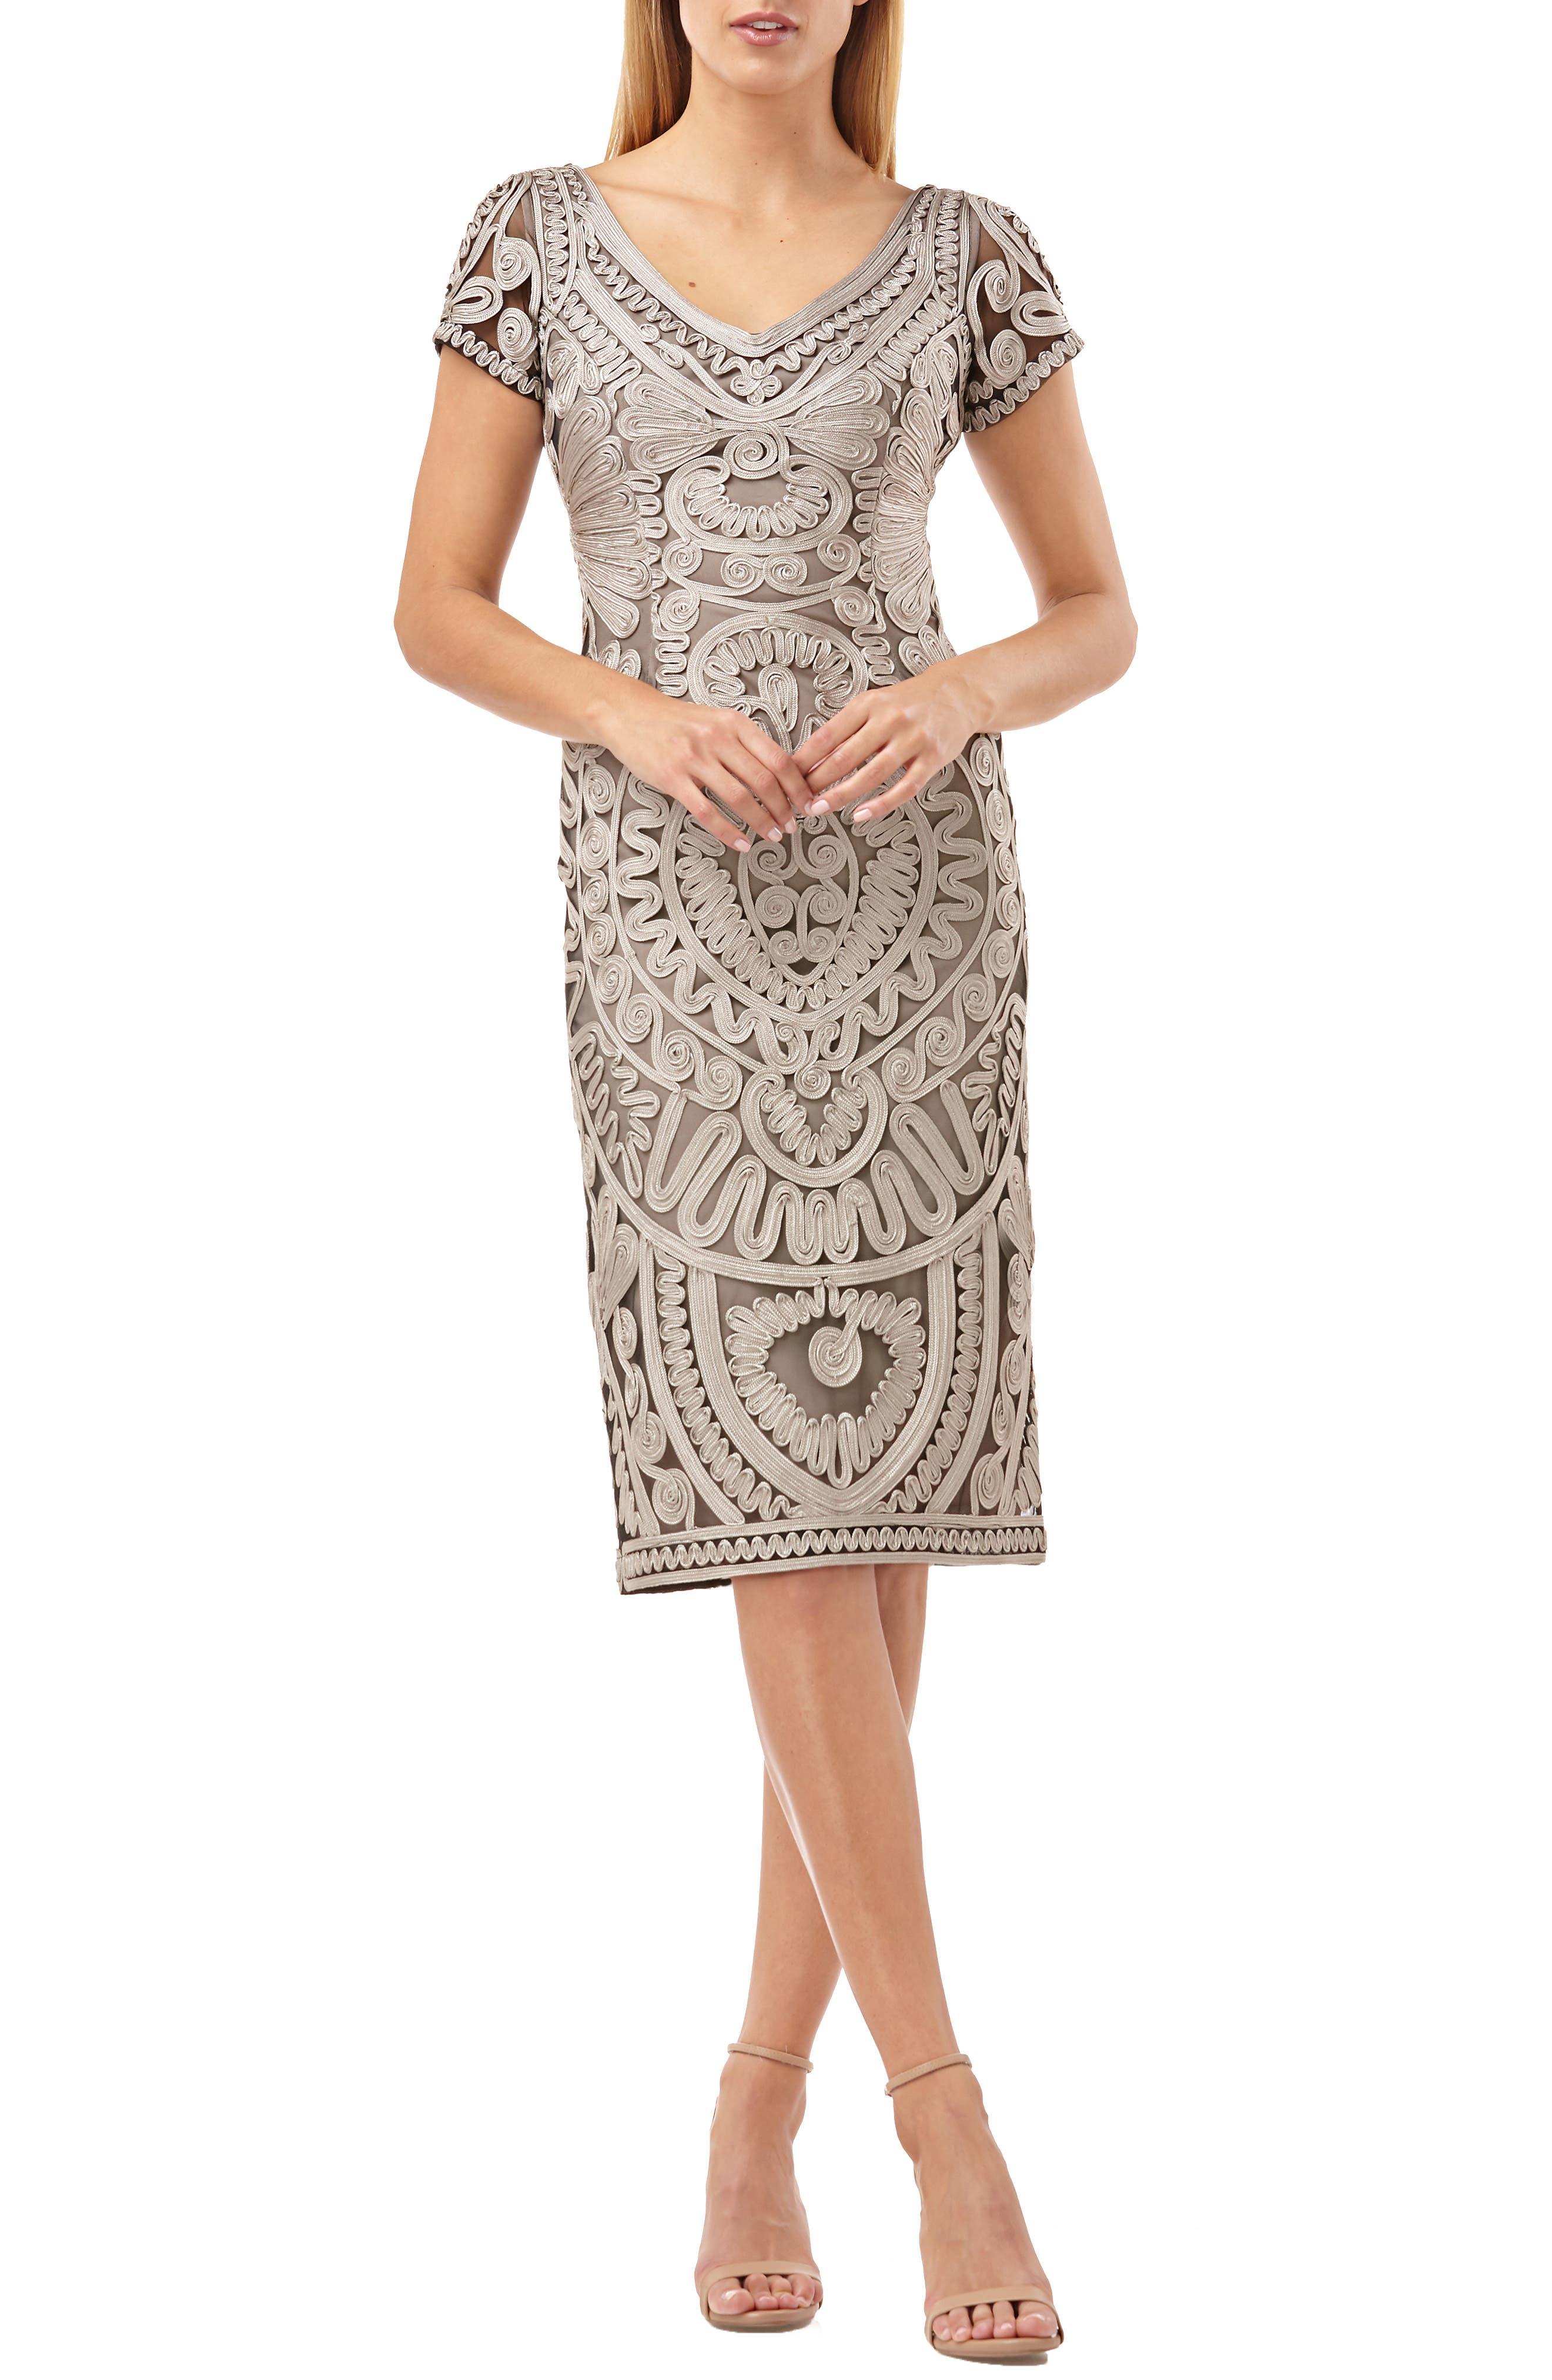 Js Collections Short Sleeve Soutache Mesh Cocktail Dress, Grey